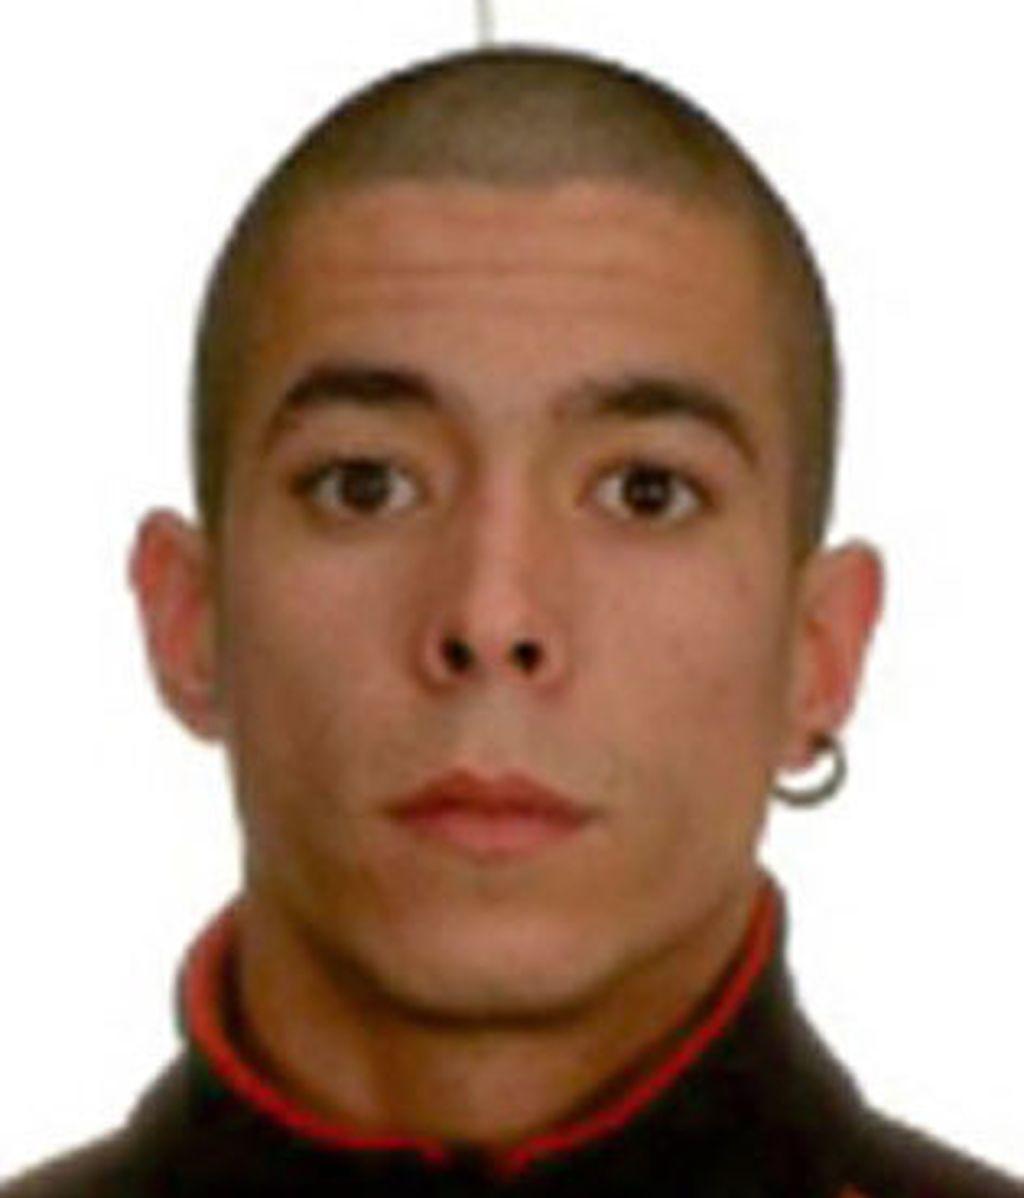 Josu Rodríguez Mallaviarrena